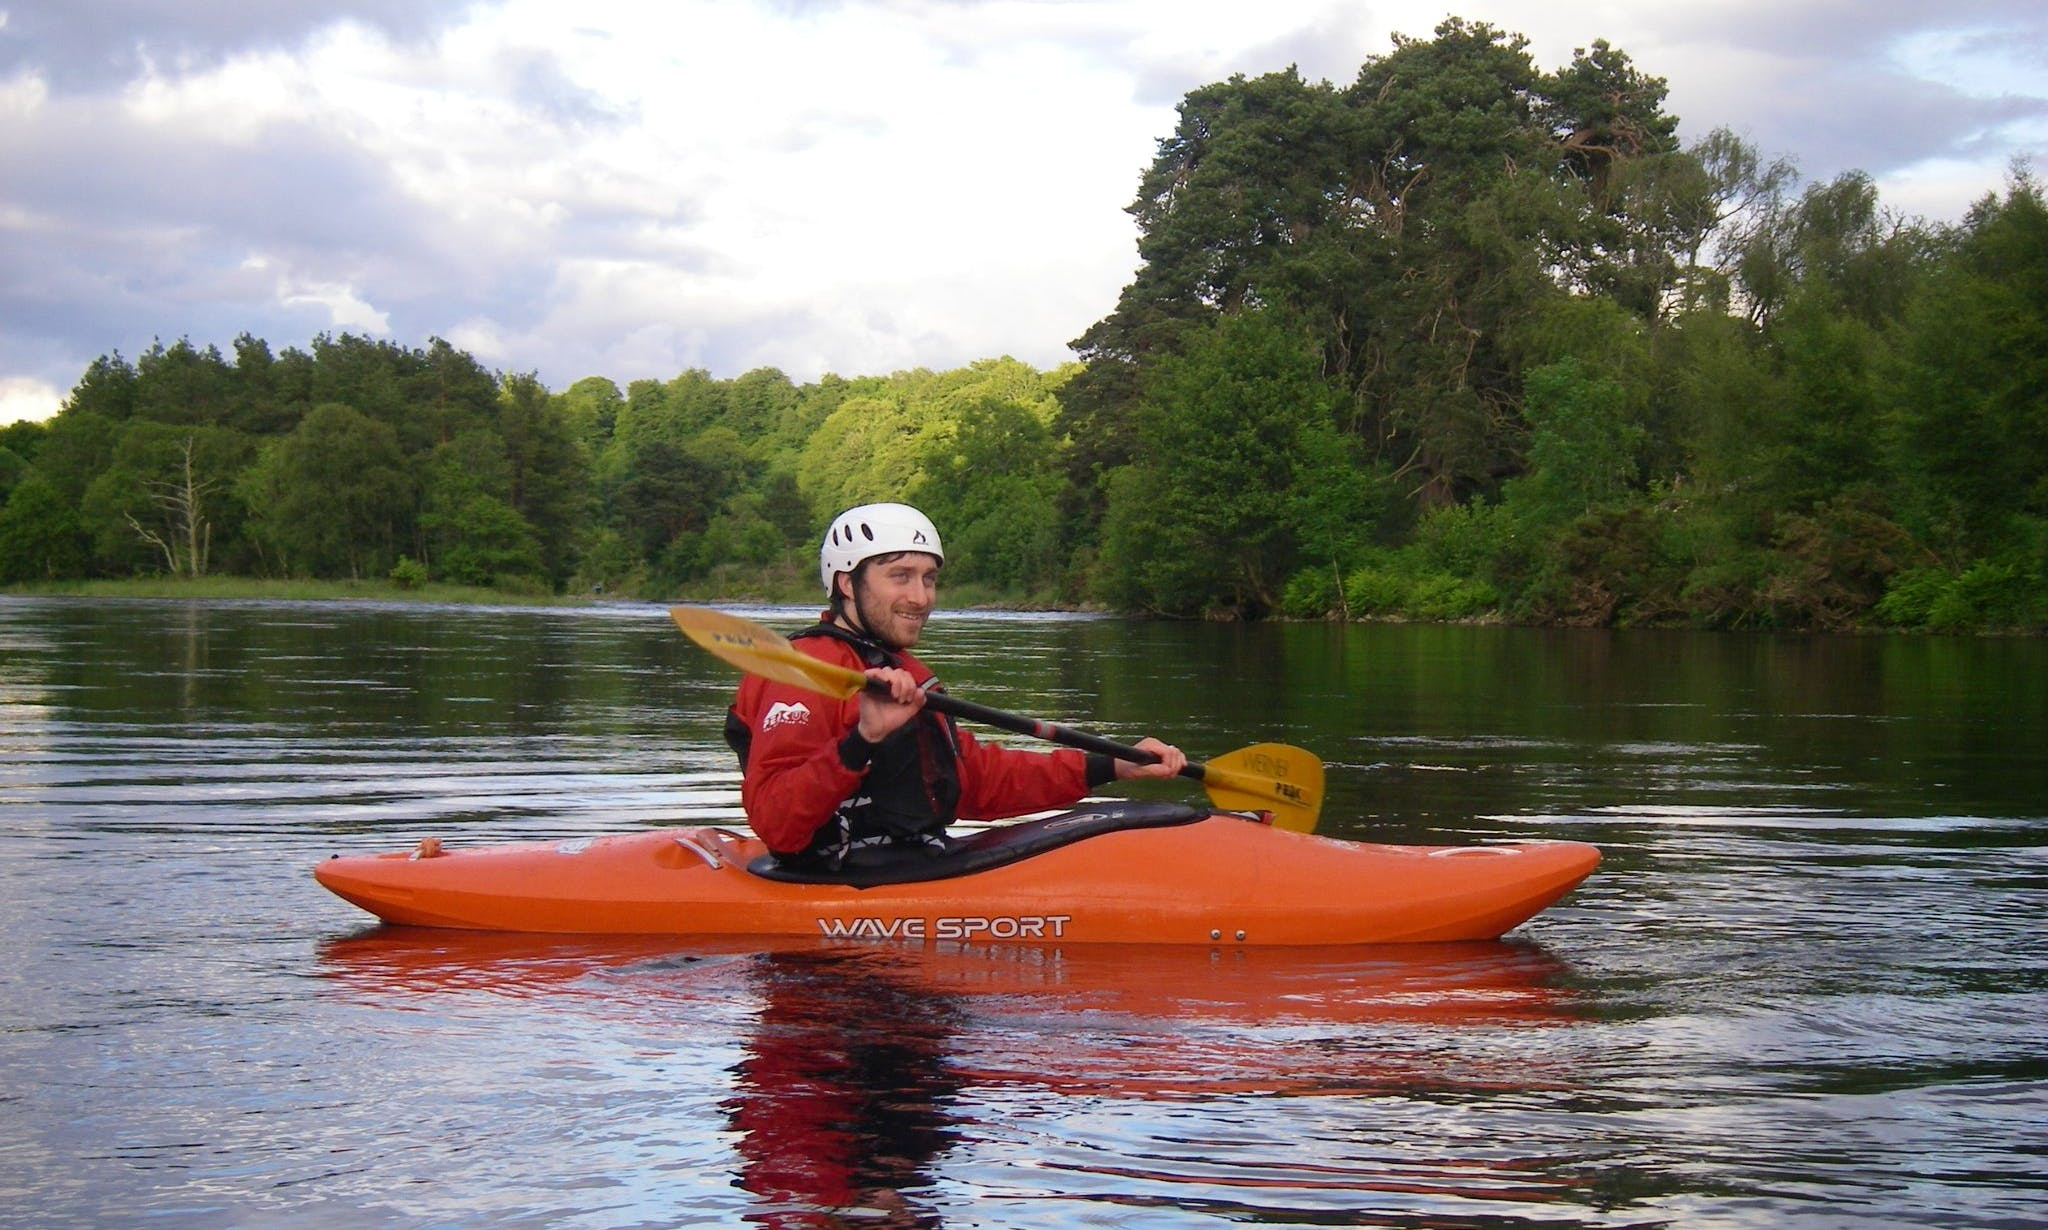 Kayak Rental in Cambridge